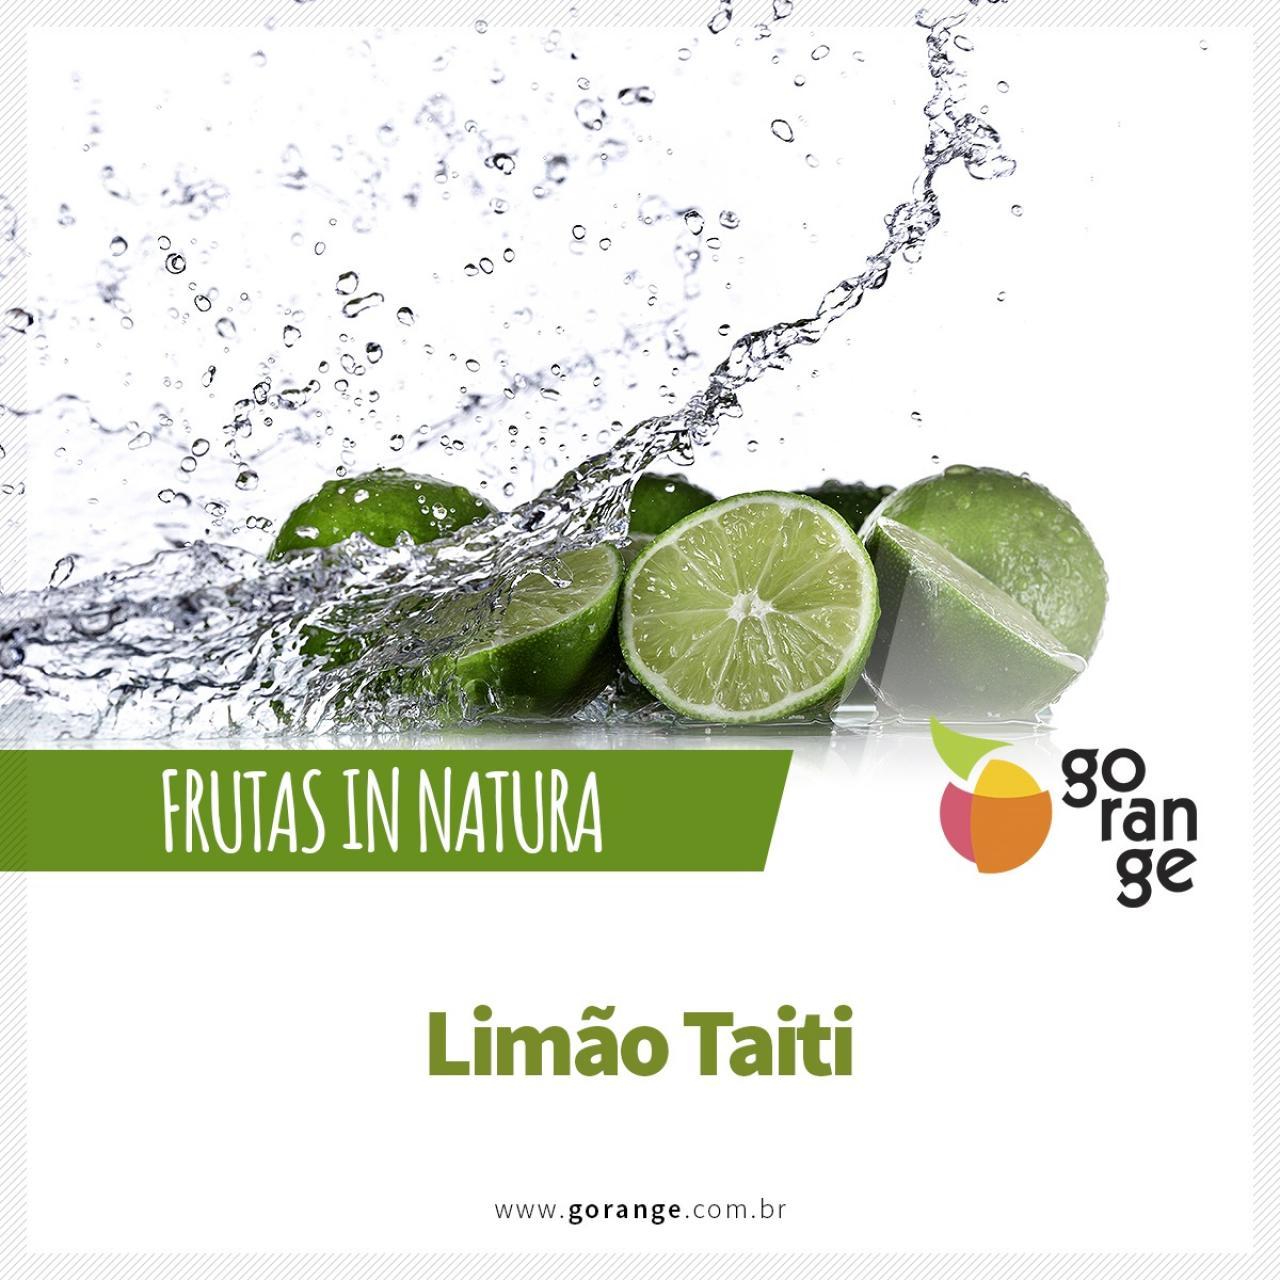 Frutas In Natura Limão Taiti